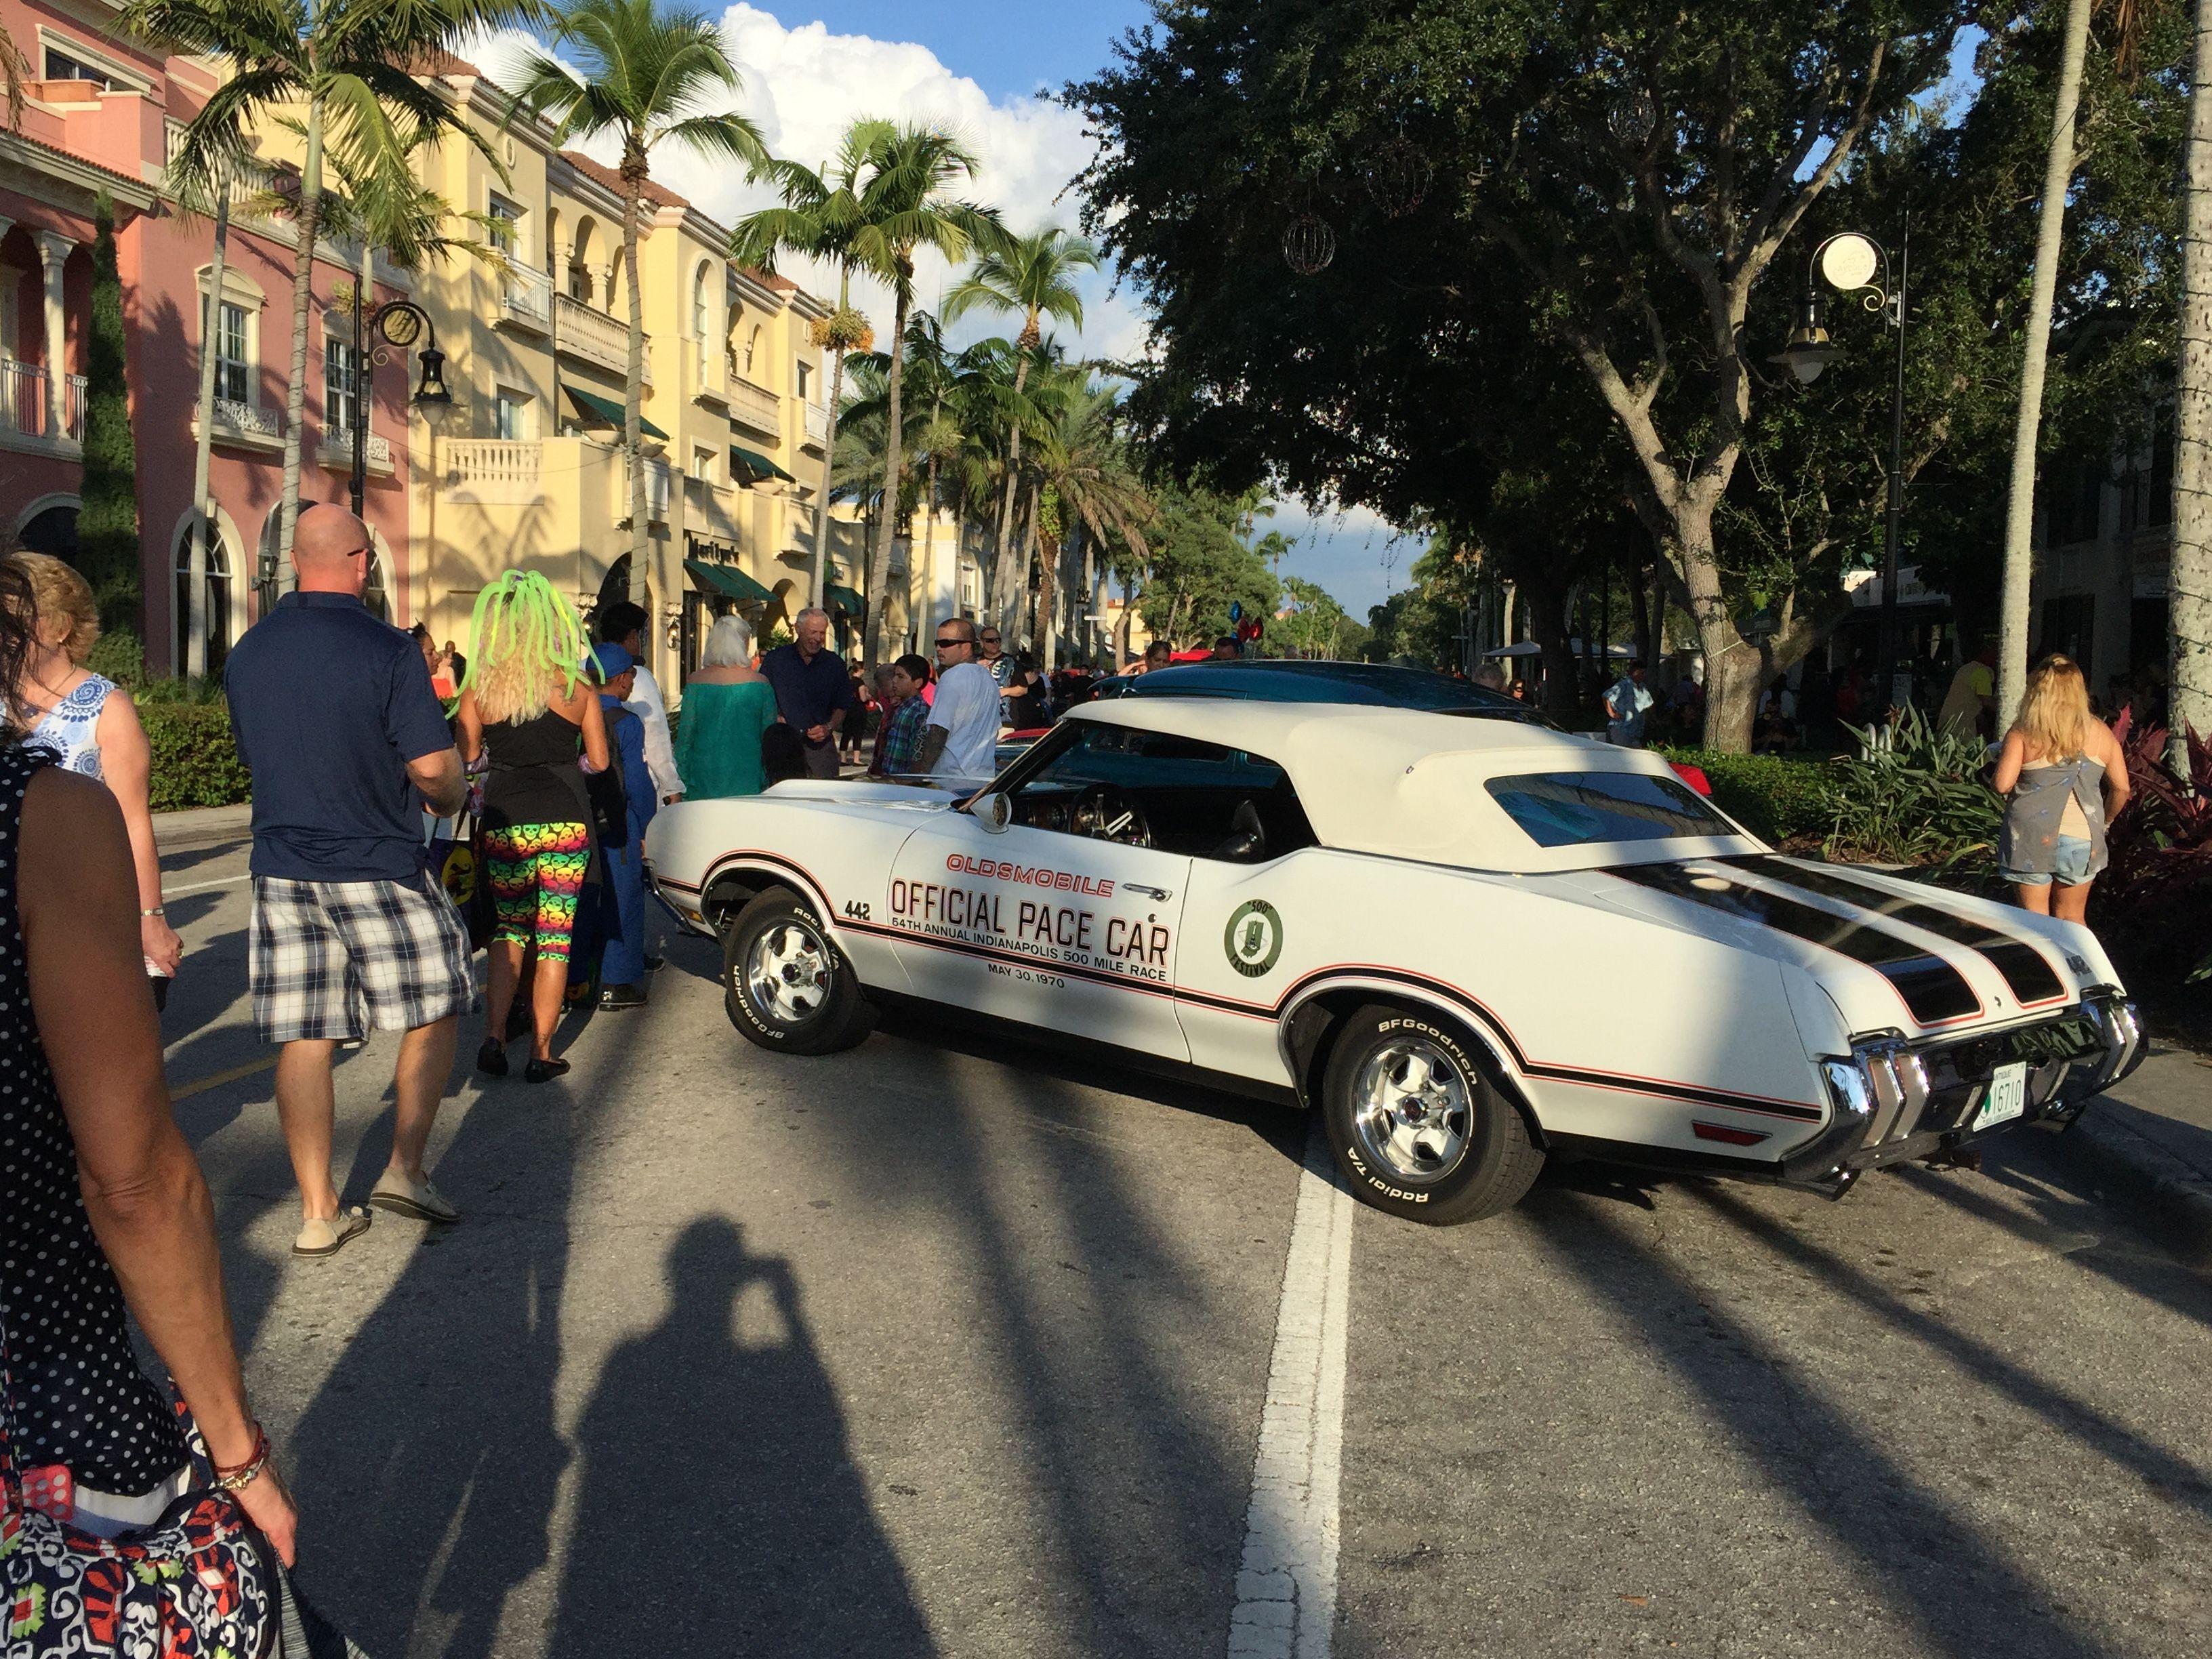 Halloween Car Show On Th Ave Naples FL Naples Florida - Car show naples fl today